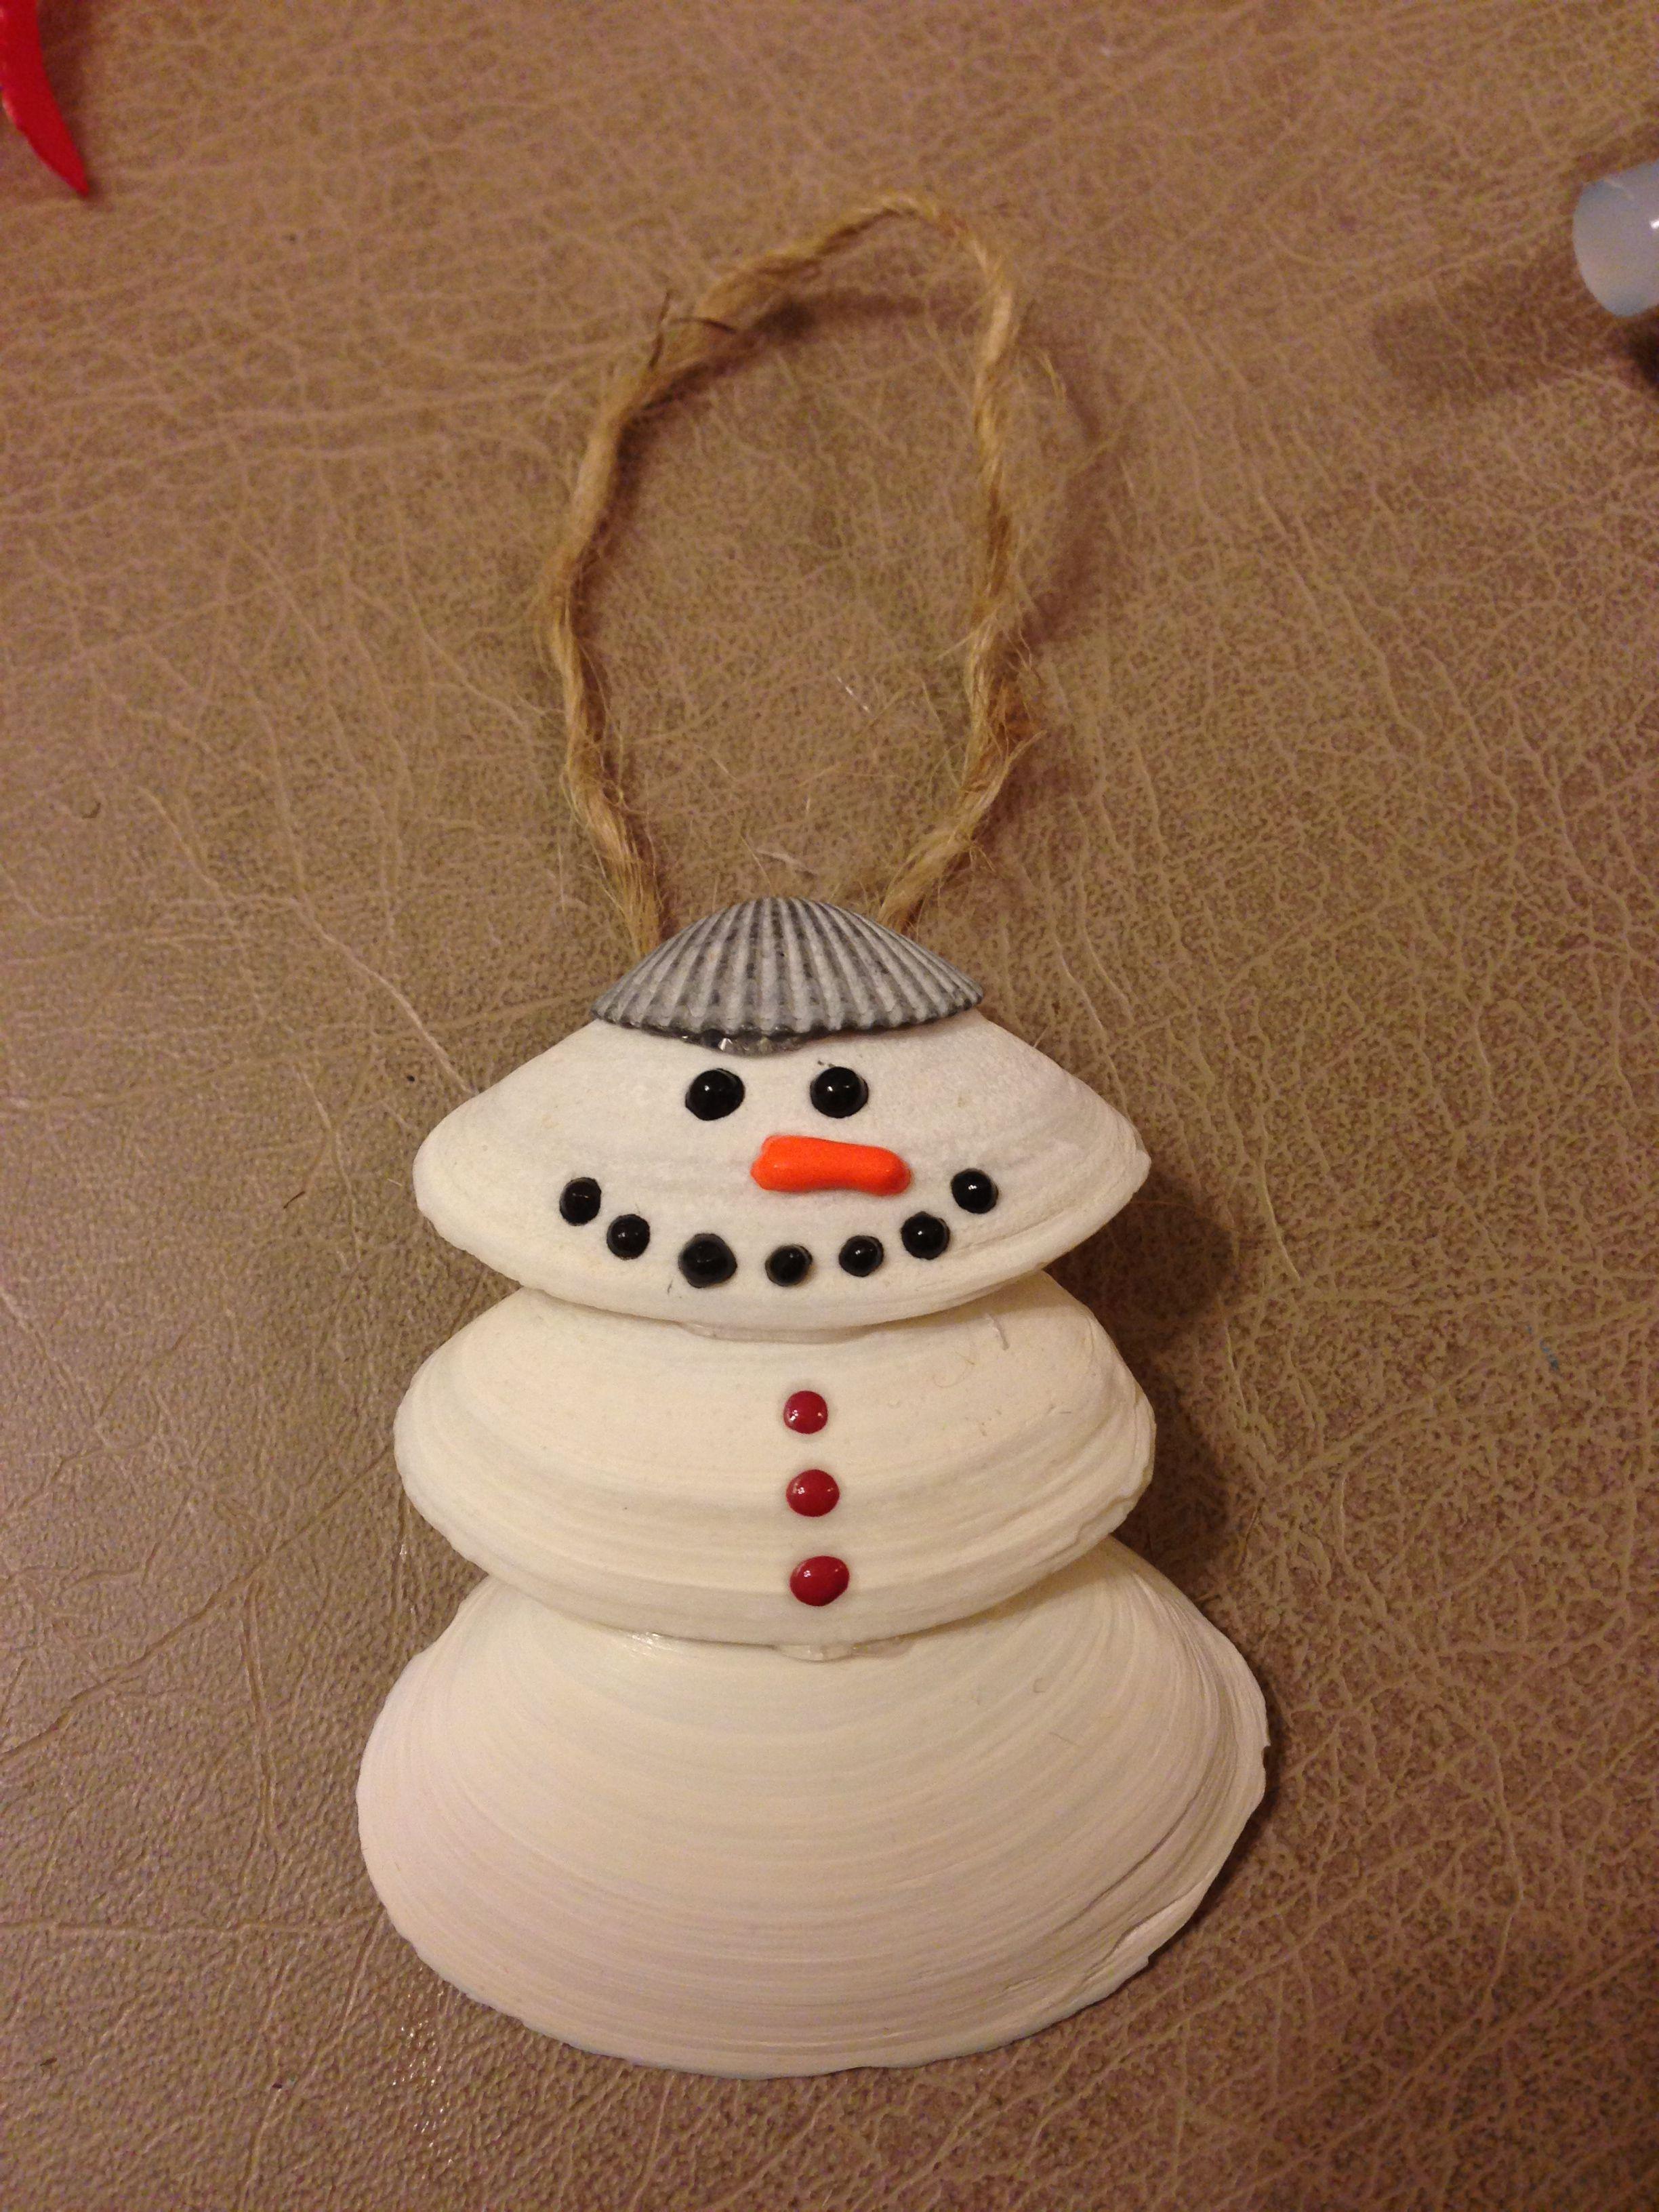 Snowman Seashell Ornament Shell Crafts Diy Shell Crafts Seashell Crafts